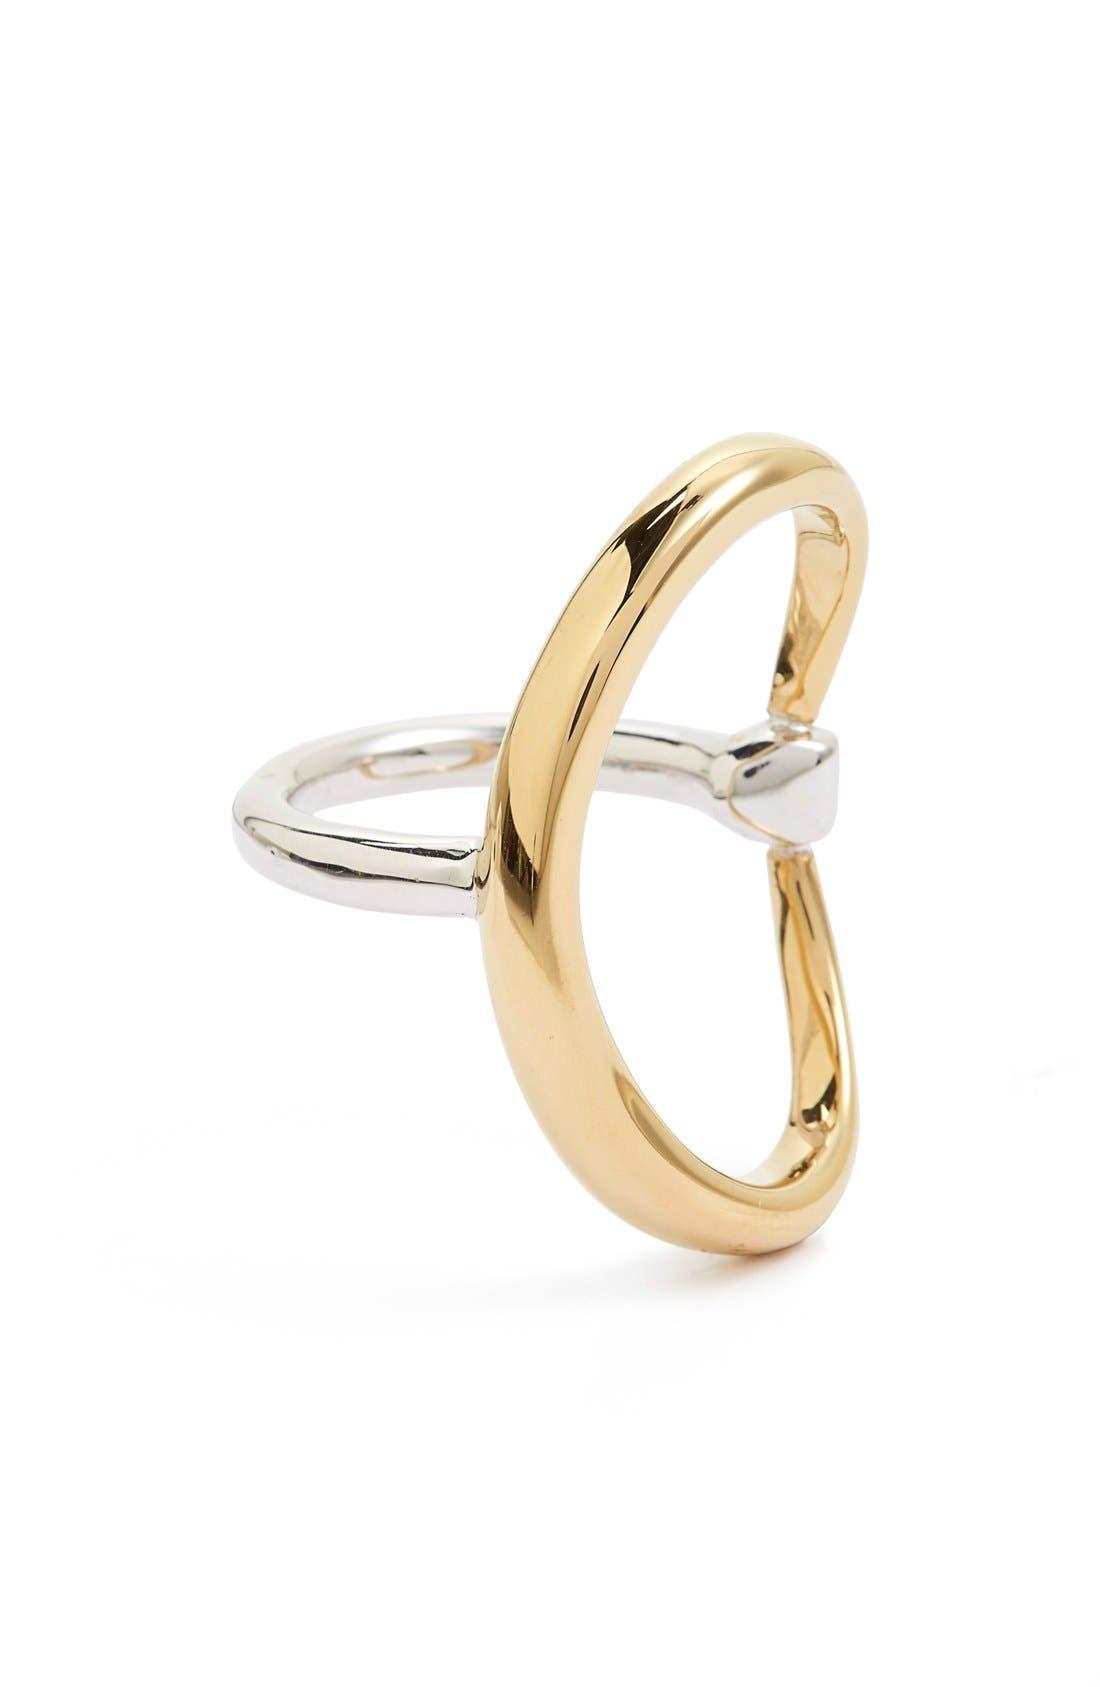 Main Image - Charlotte Chesnais Turtle Ring